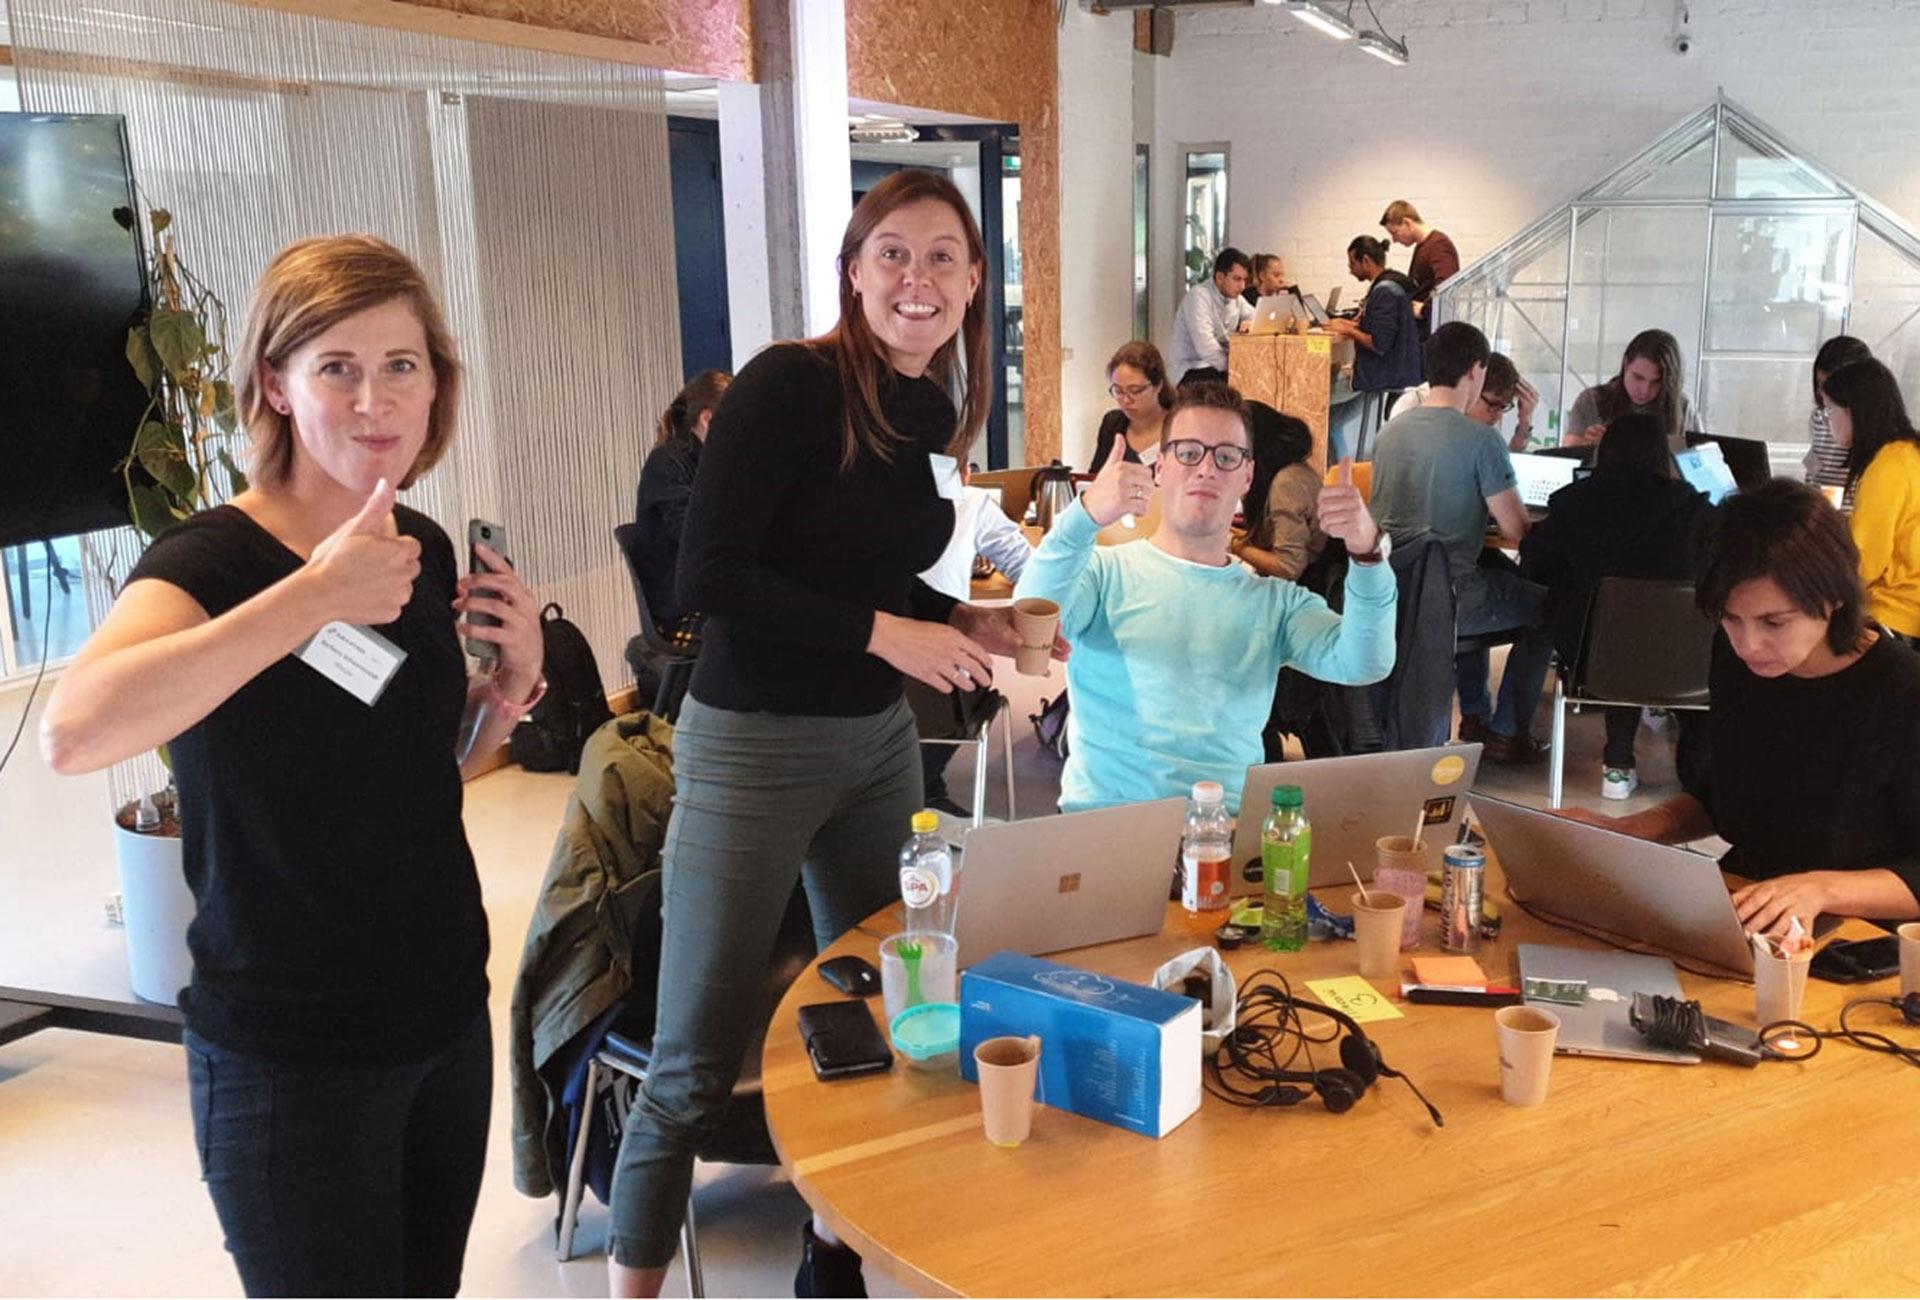 macaw hackathon 2019